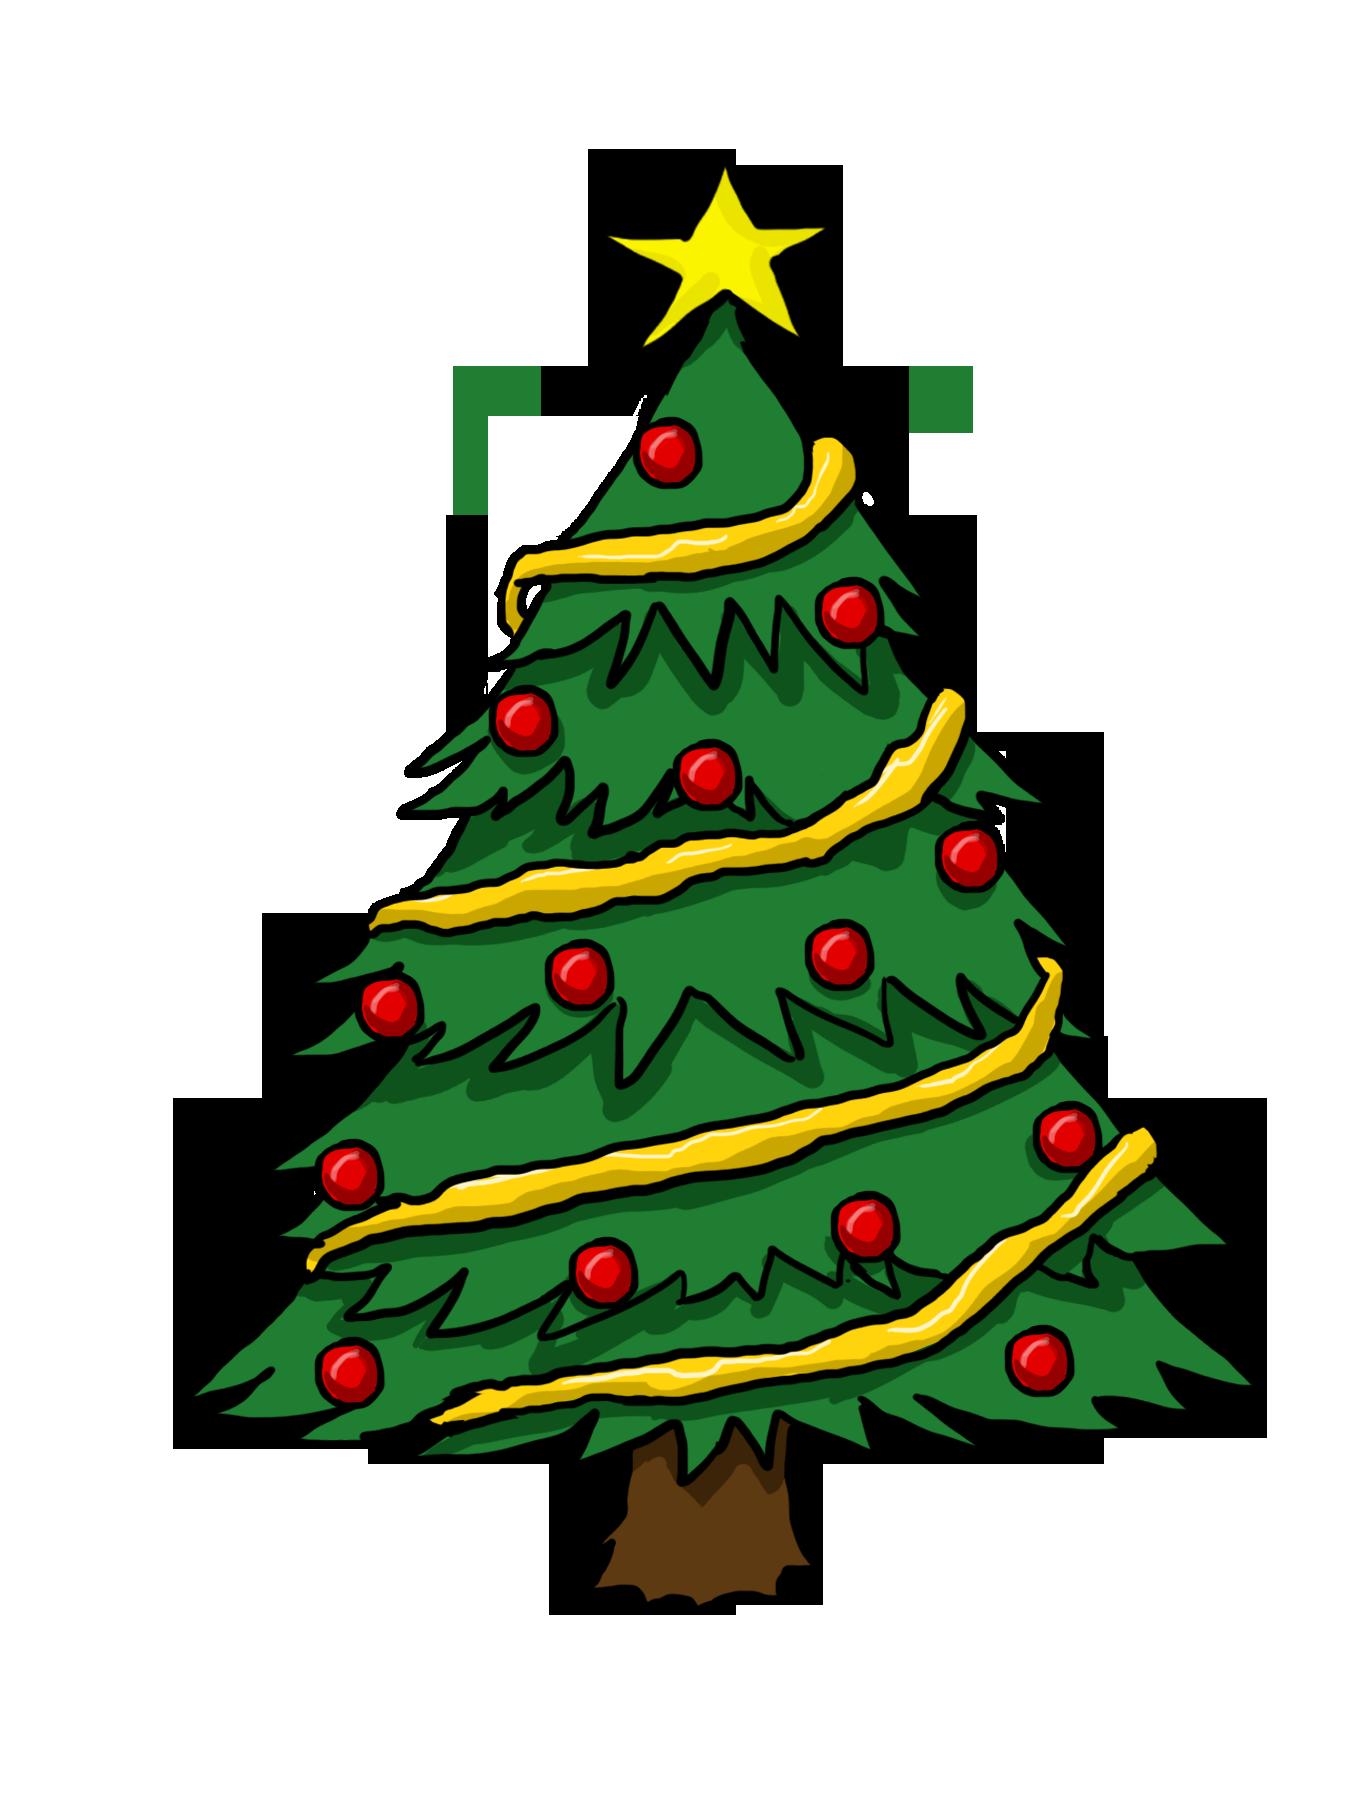 Free To Use Public Domain Christmas Tree-Free to Use Public Domain Christmas Tree Clip Art - Page 2-17